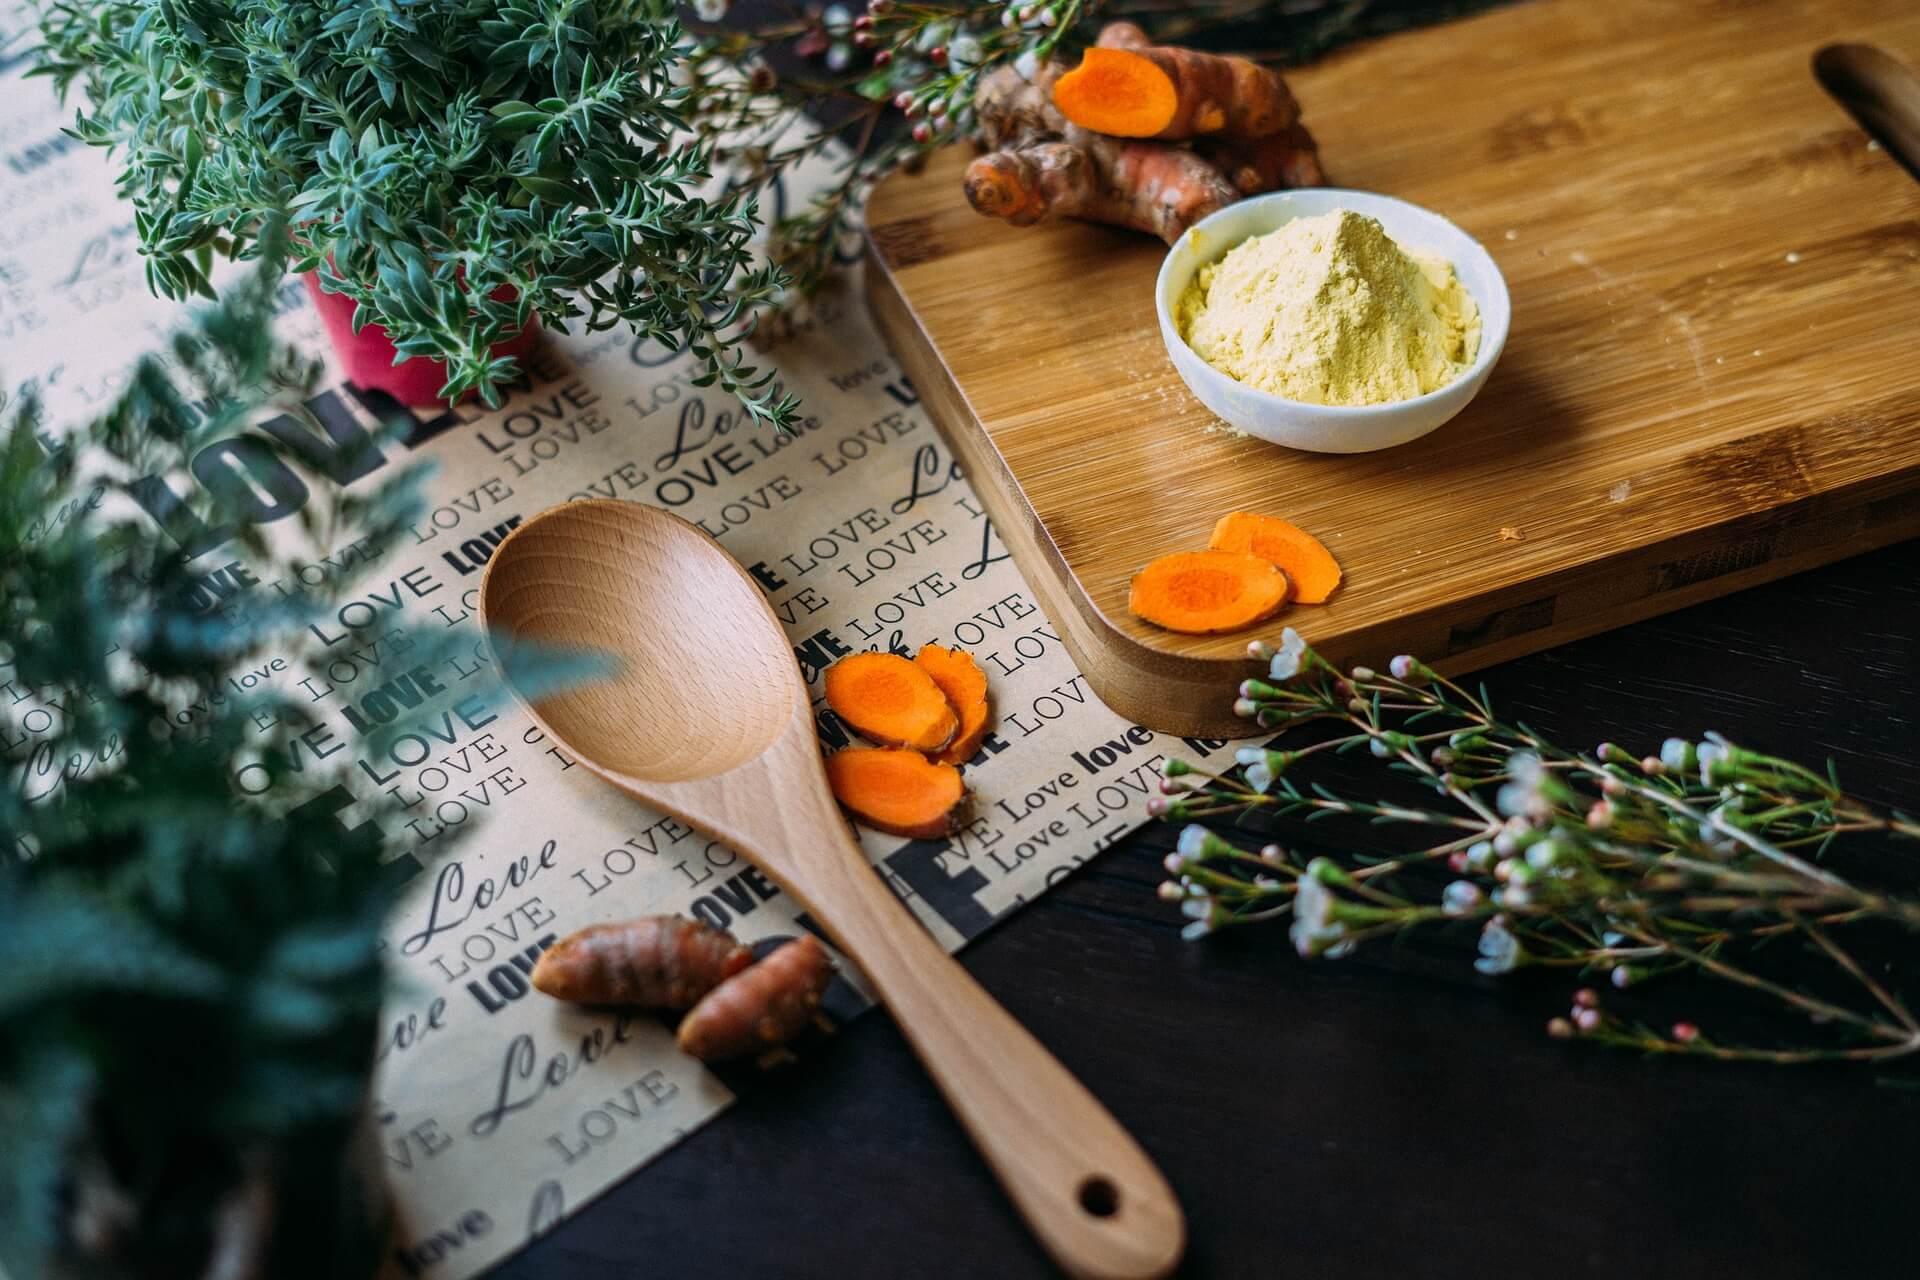 Enjoy an epicurean gastronomic discovery journey